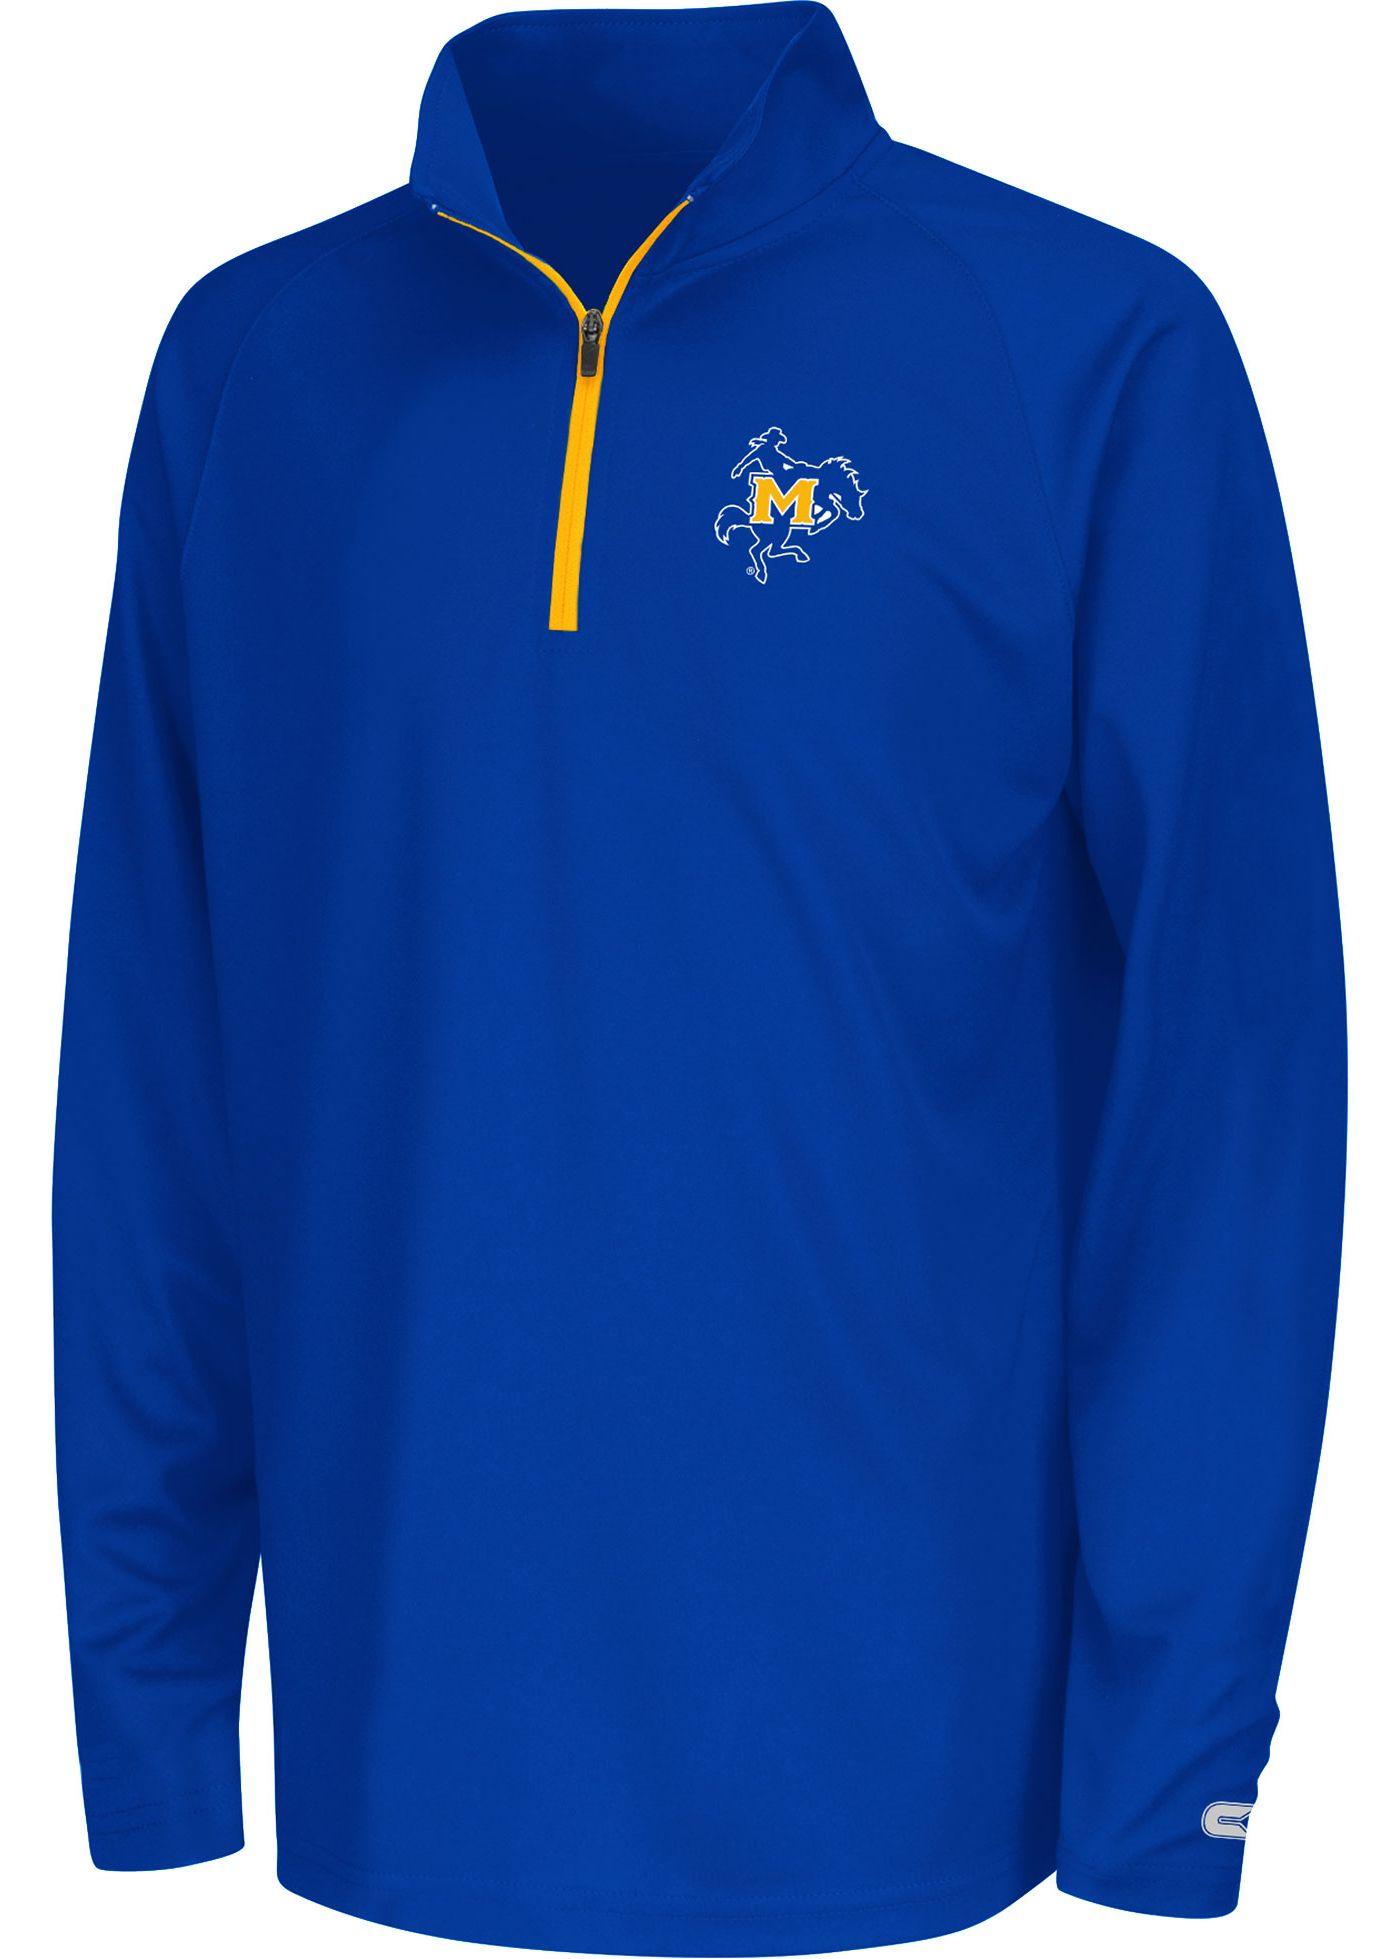 Colosseum Youth McNeese State Cowboys Royal Blue Draft Quarter-Zip Shirt